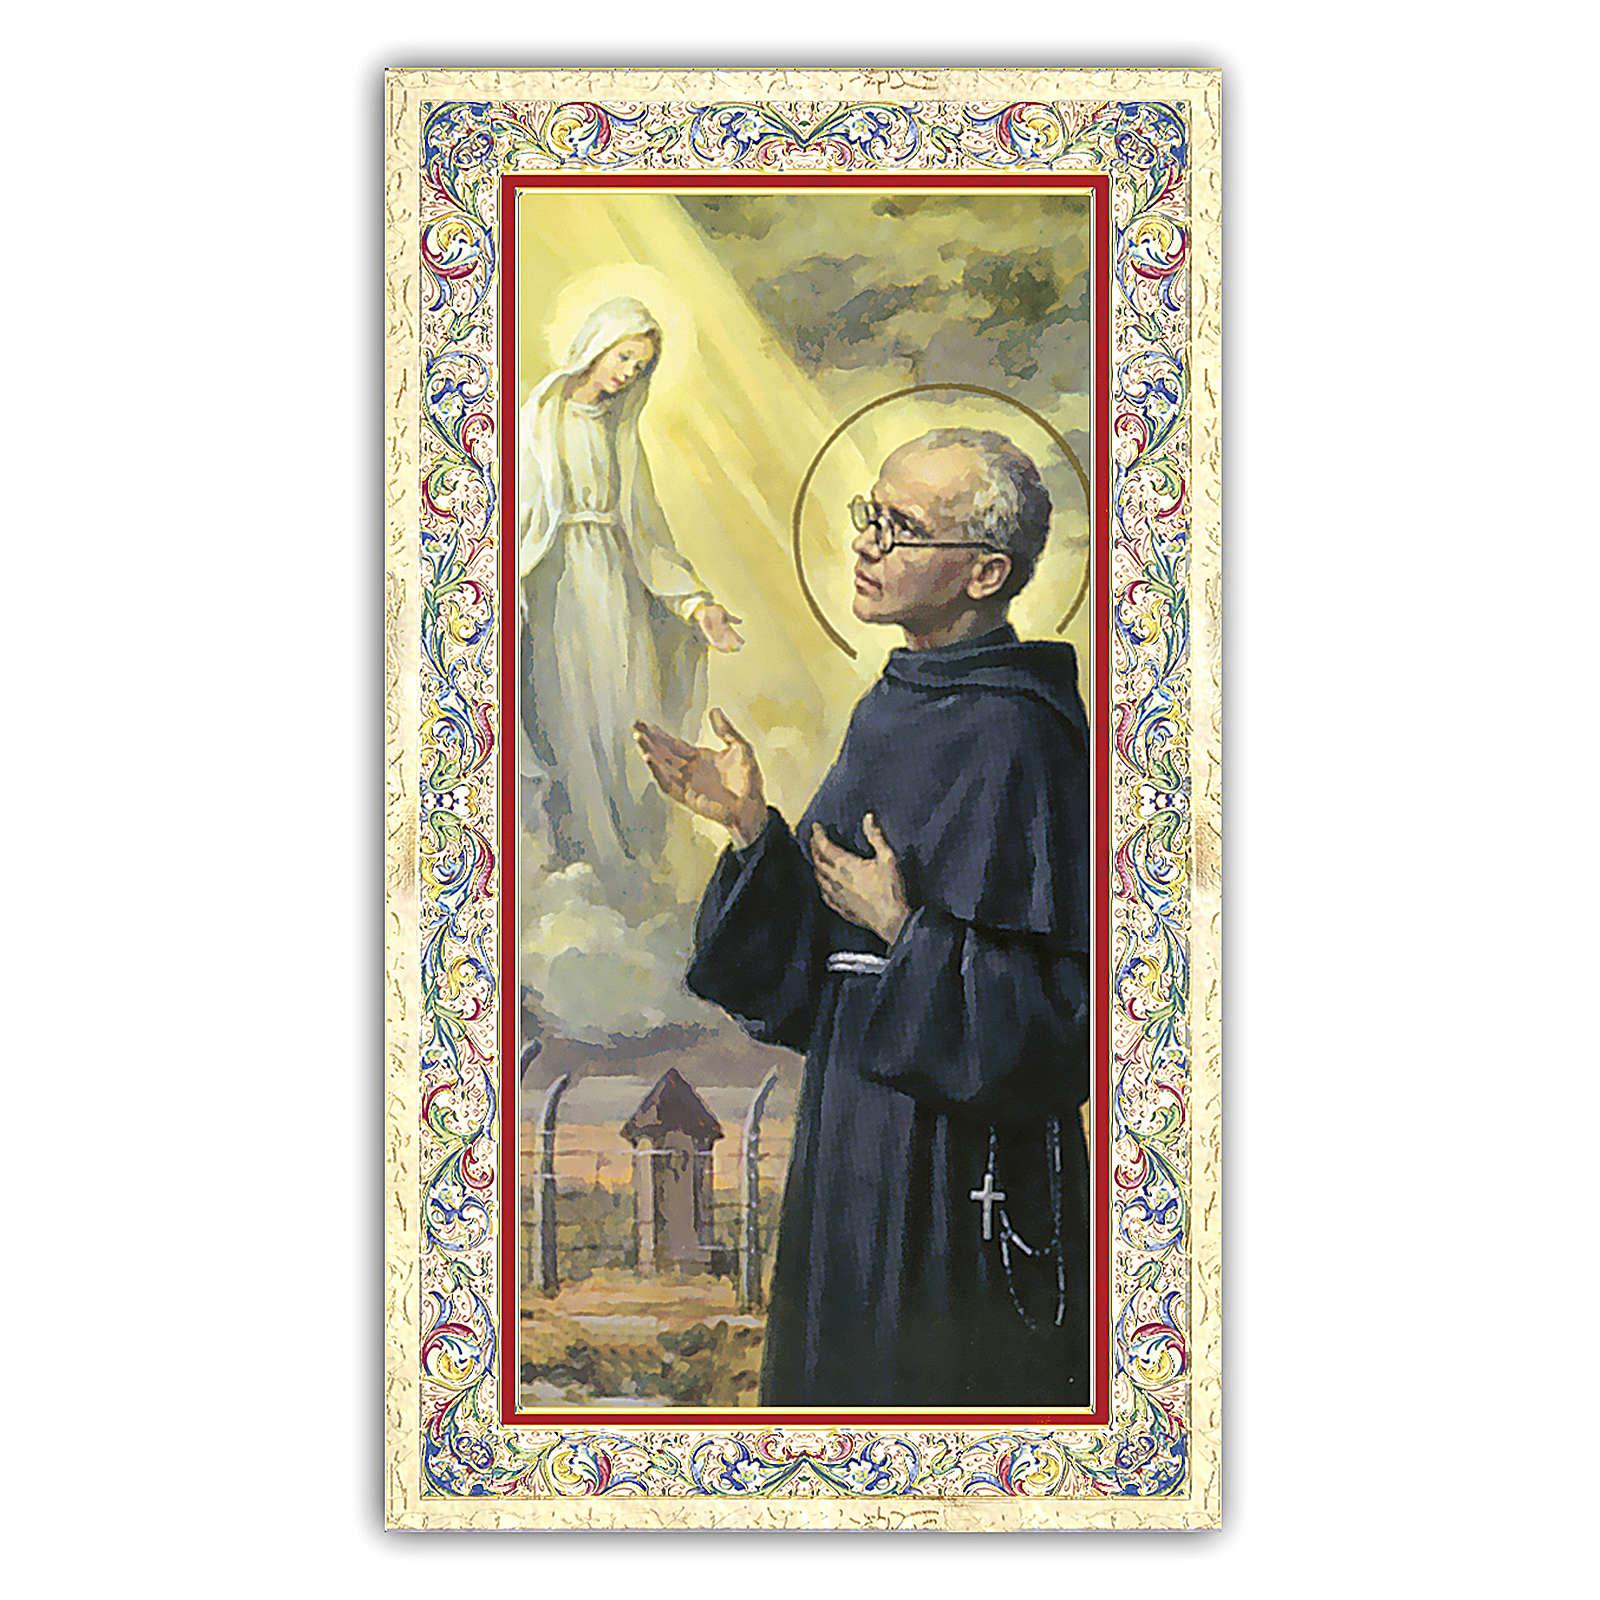 Santino San Massimilano Kolbe 10x5 cm ITA 4